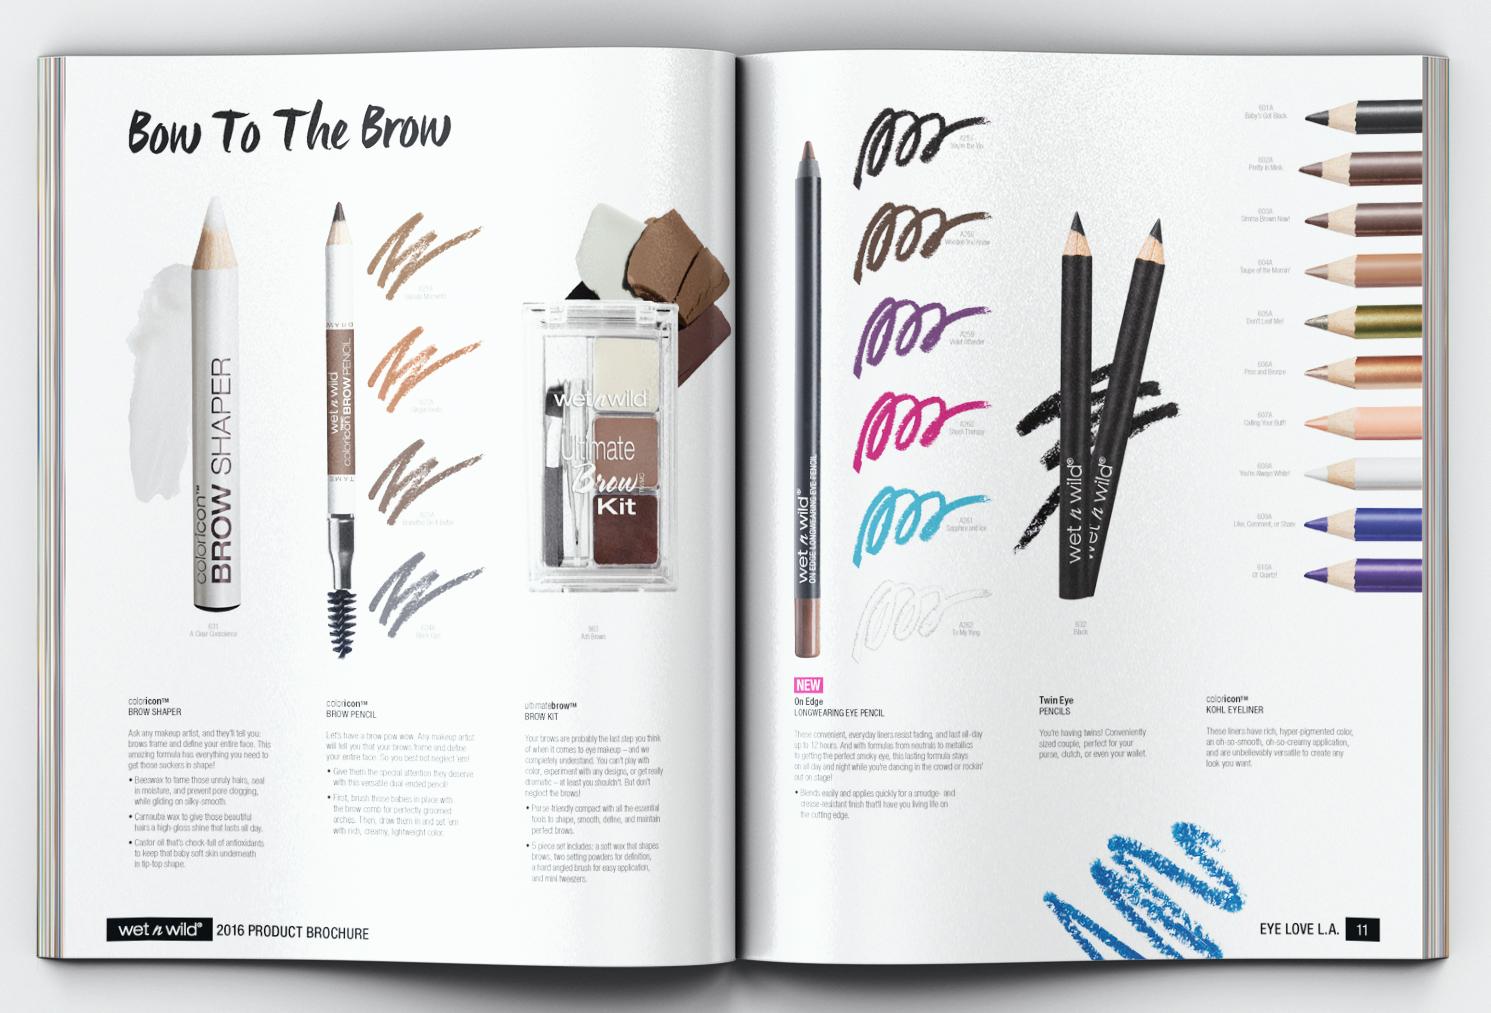 Natl_Product_Brochure_06.jpg